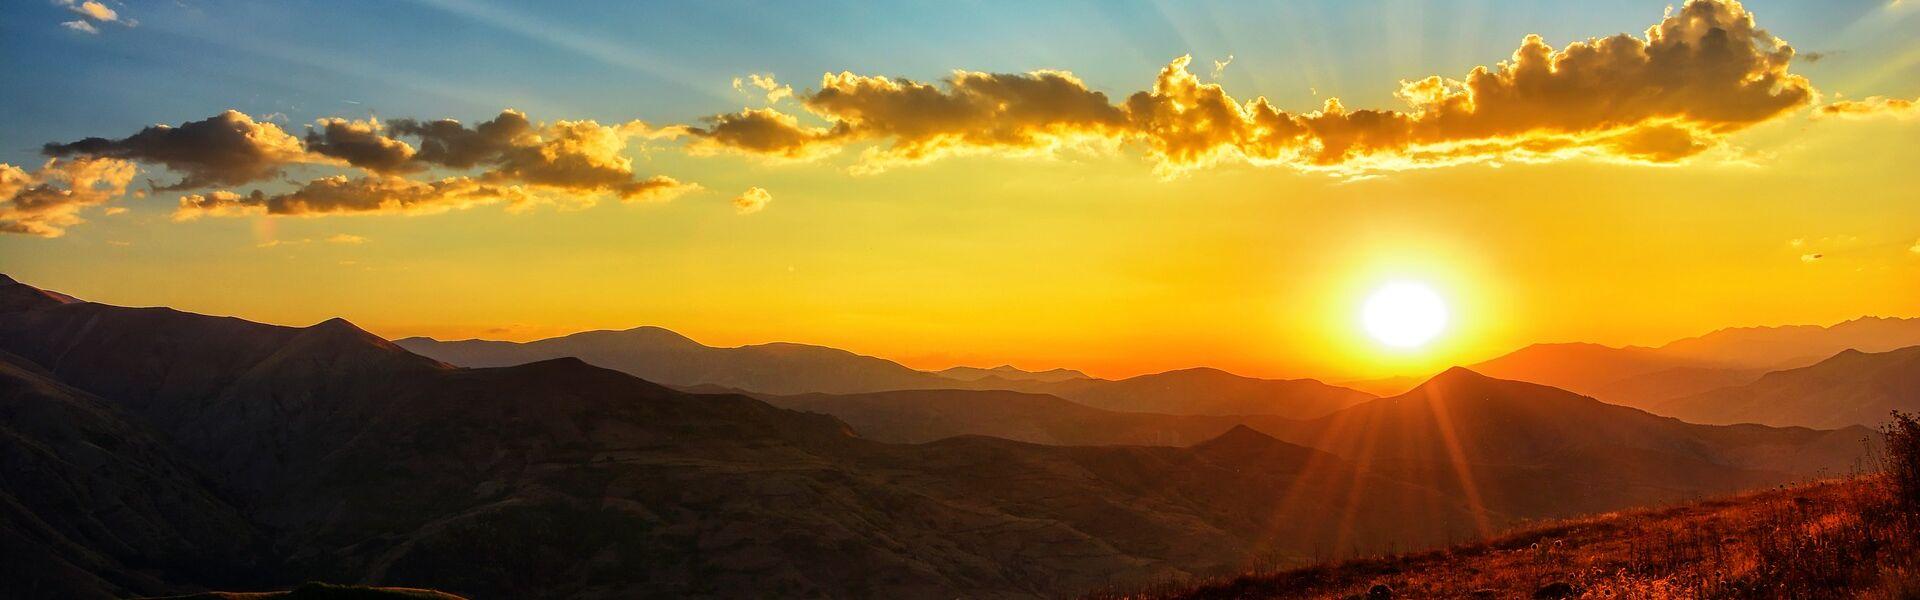 sunset-3314275_1920